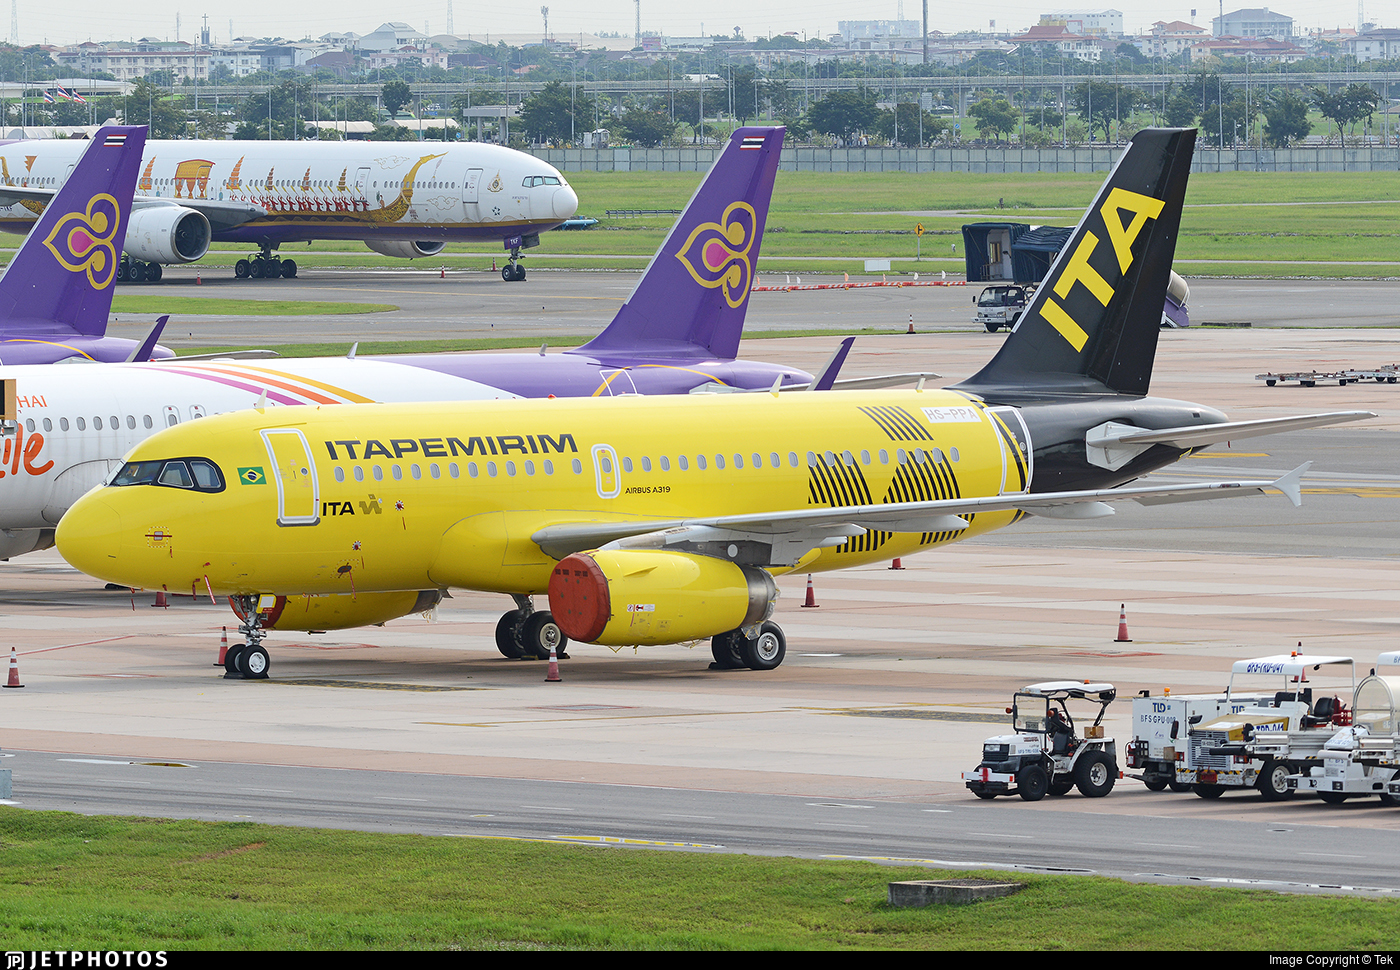 HS-PPA - Airbus A319-132 - ITA Transportes Aereos